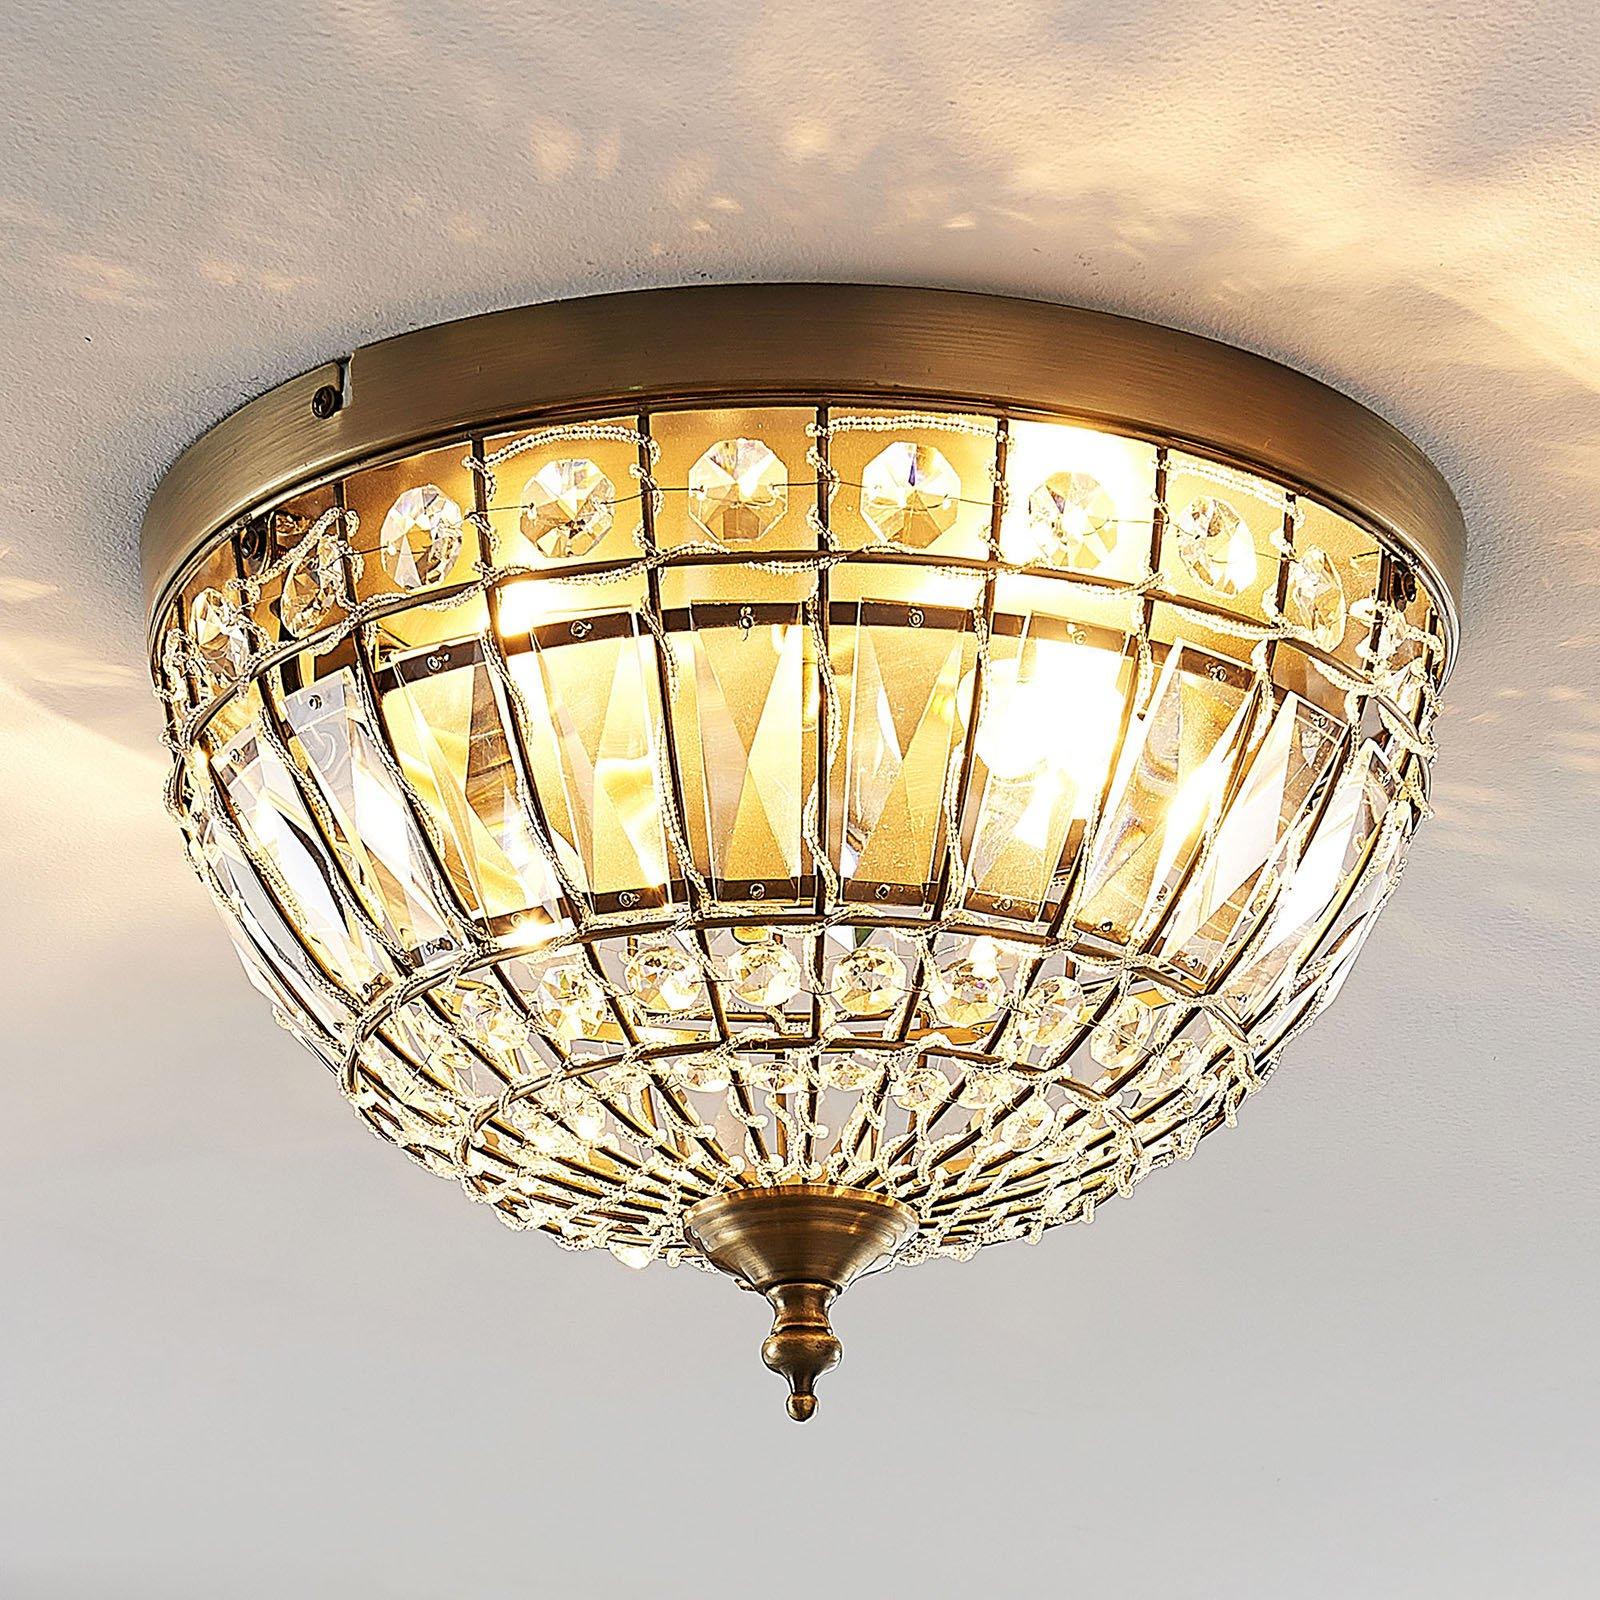 Lindby Jamaal taklampe av glass